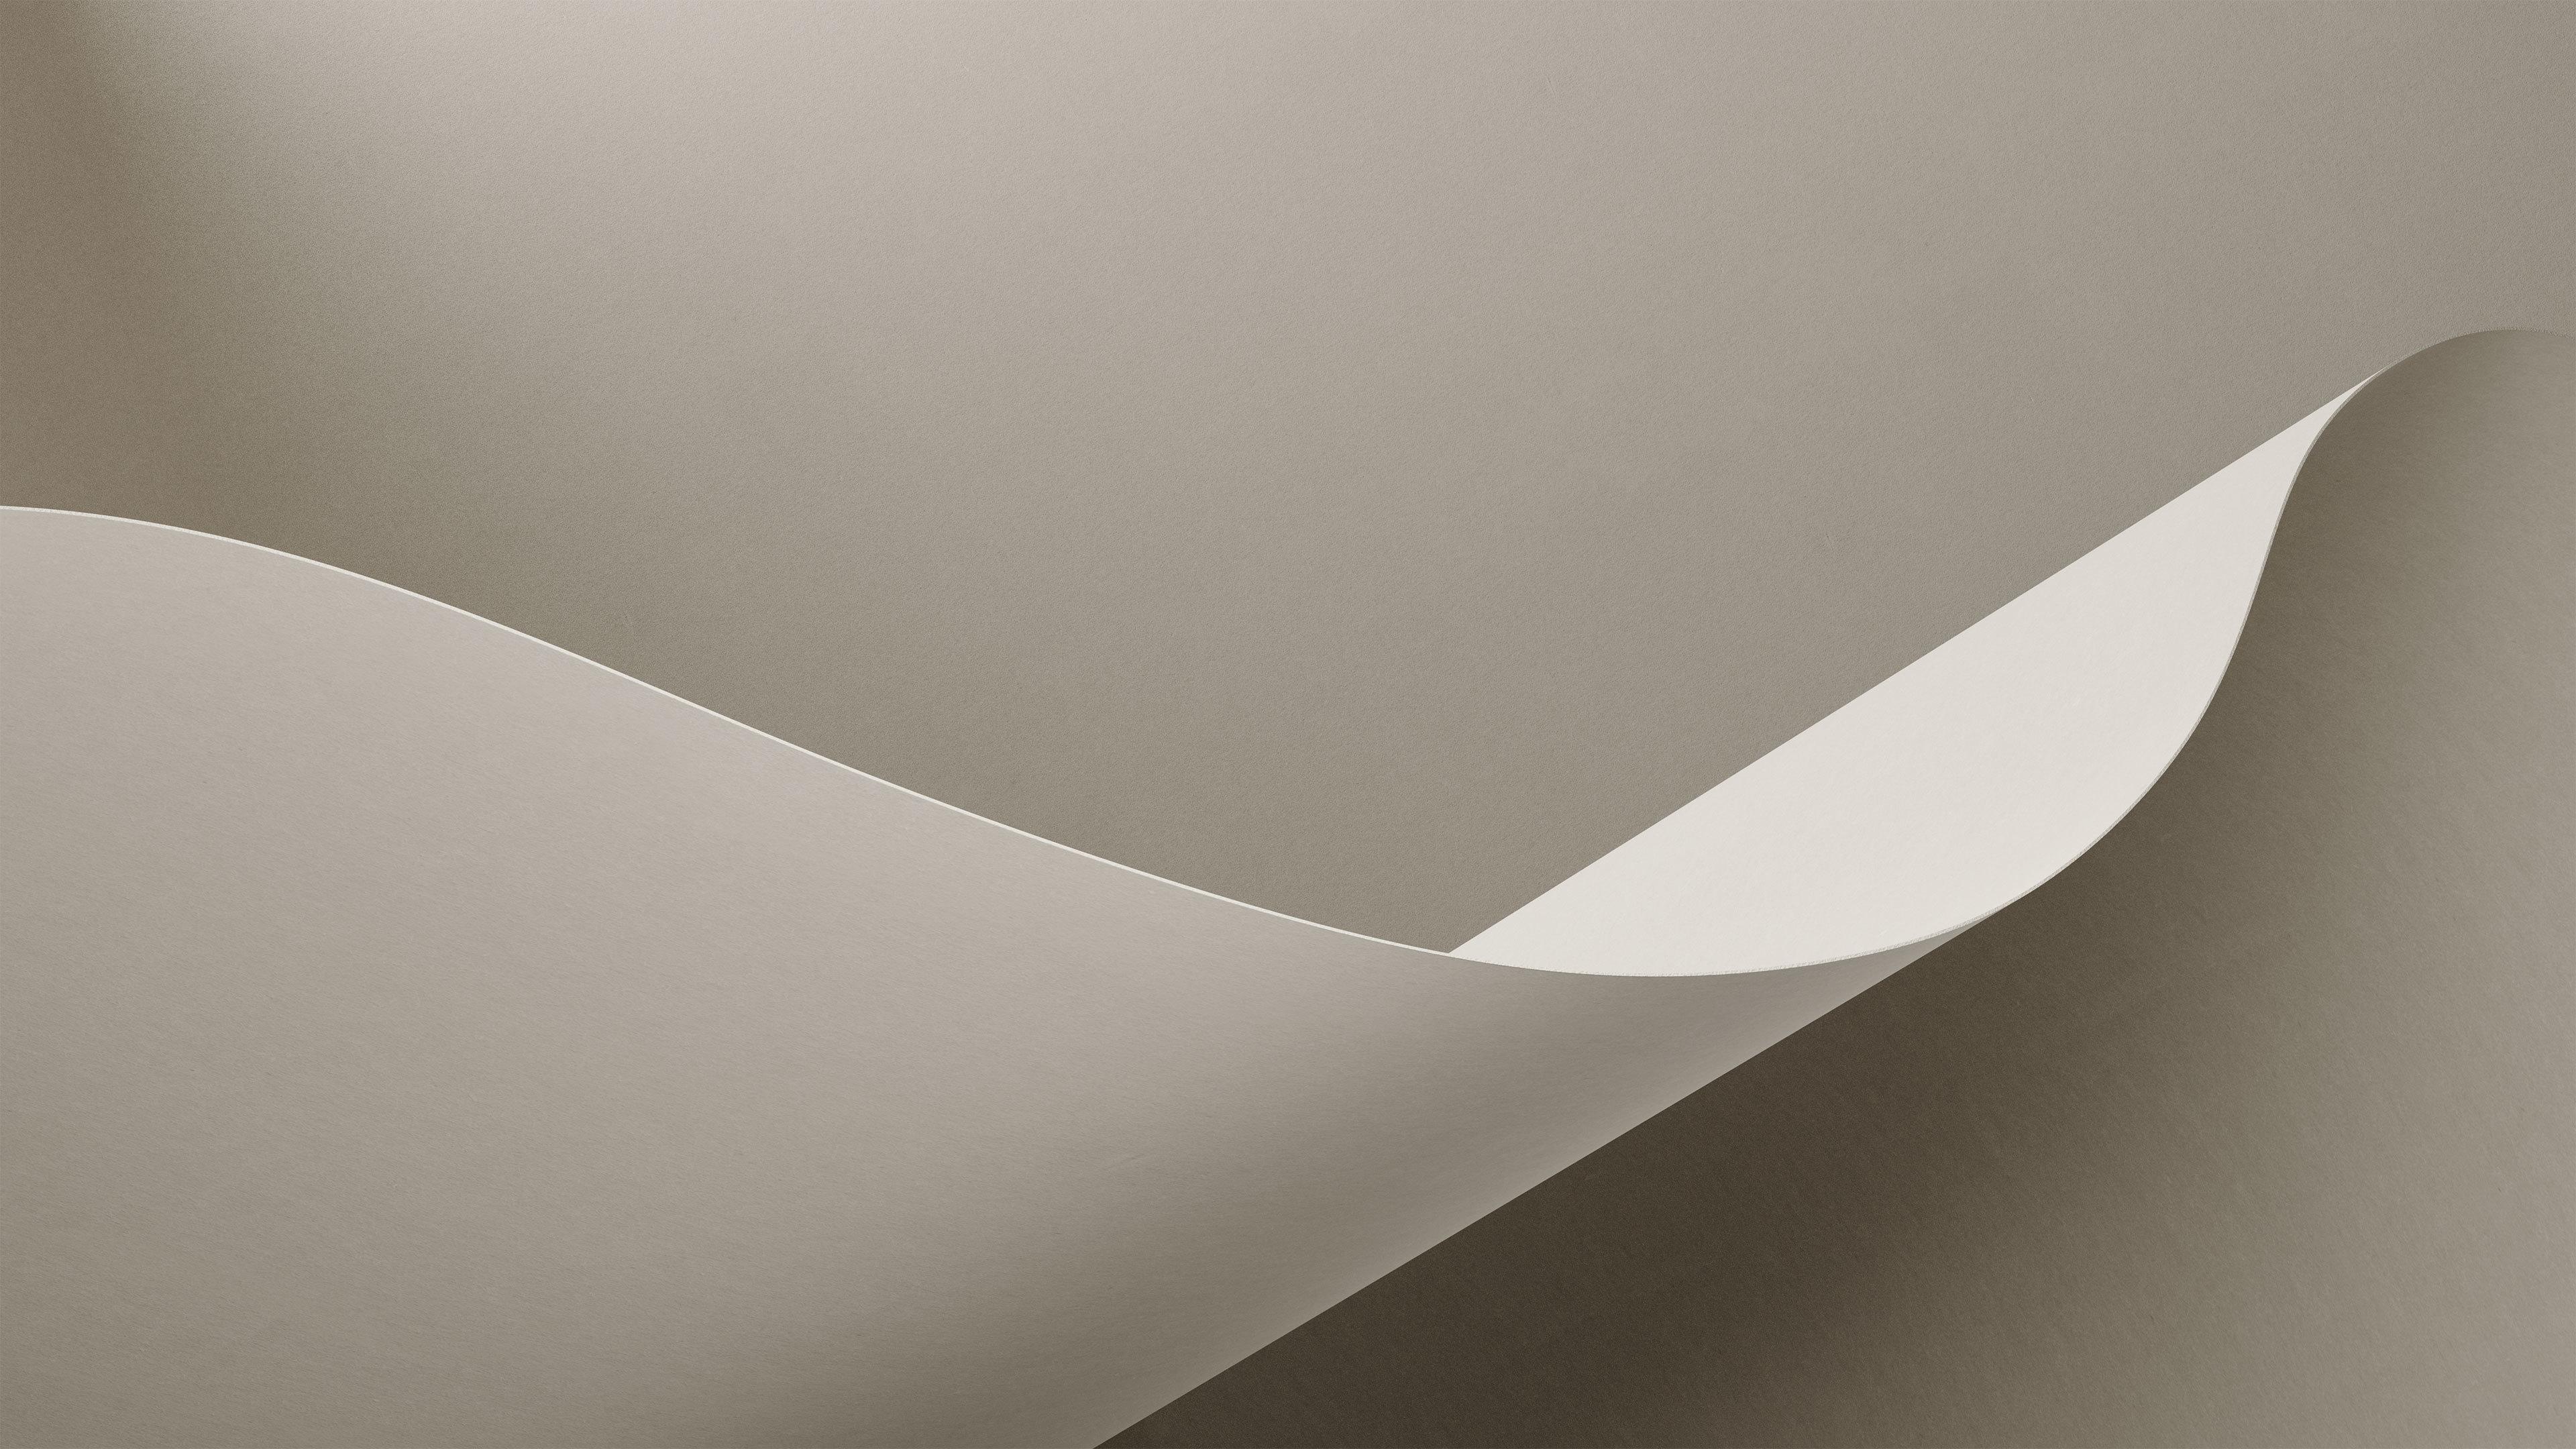 Landscape debrauw paper warm grey high res 1